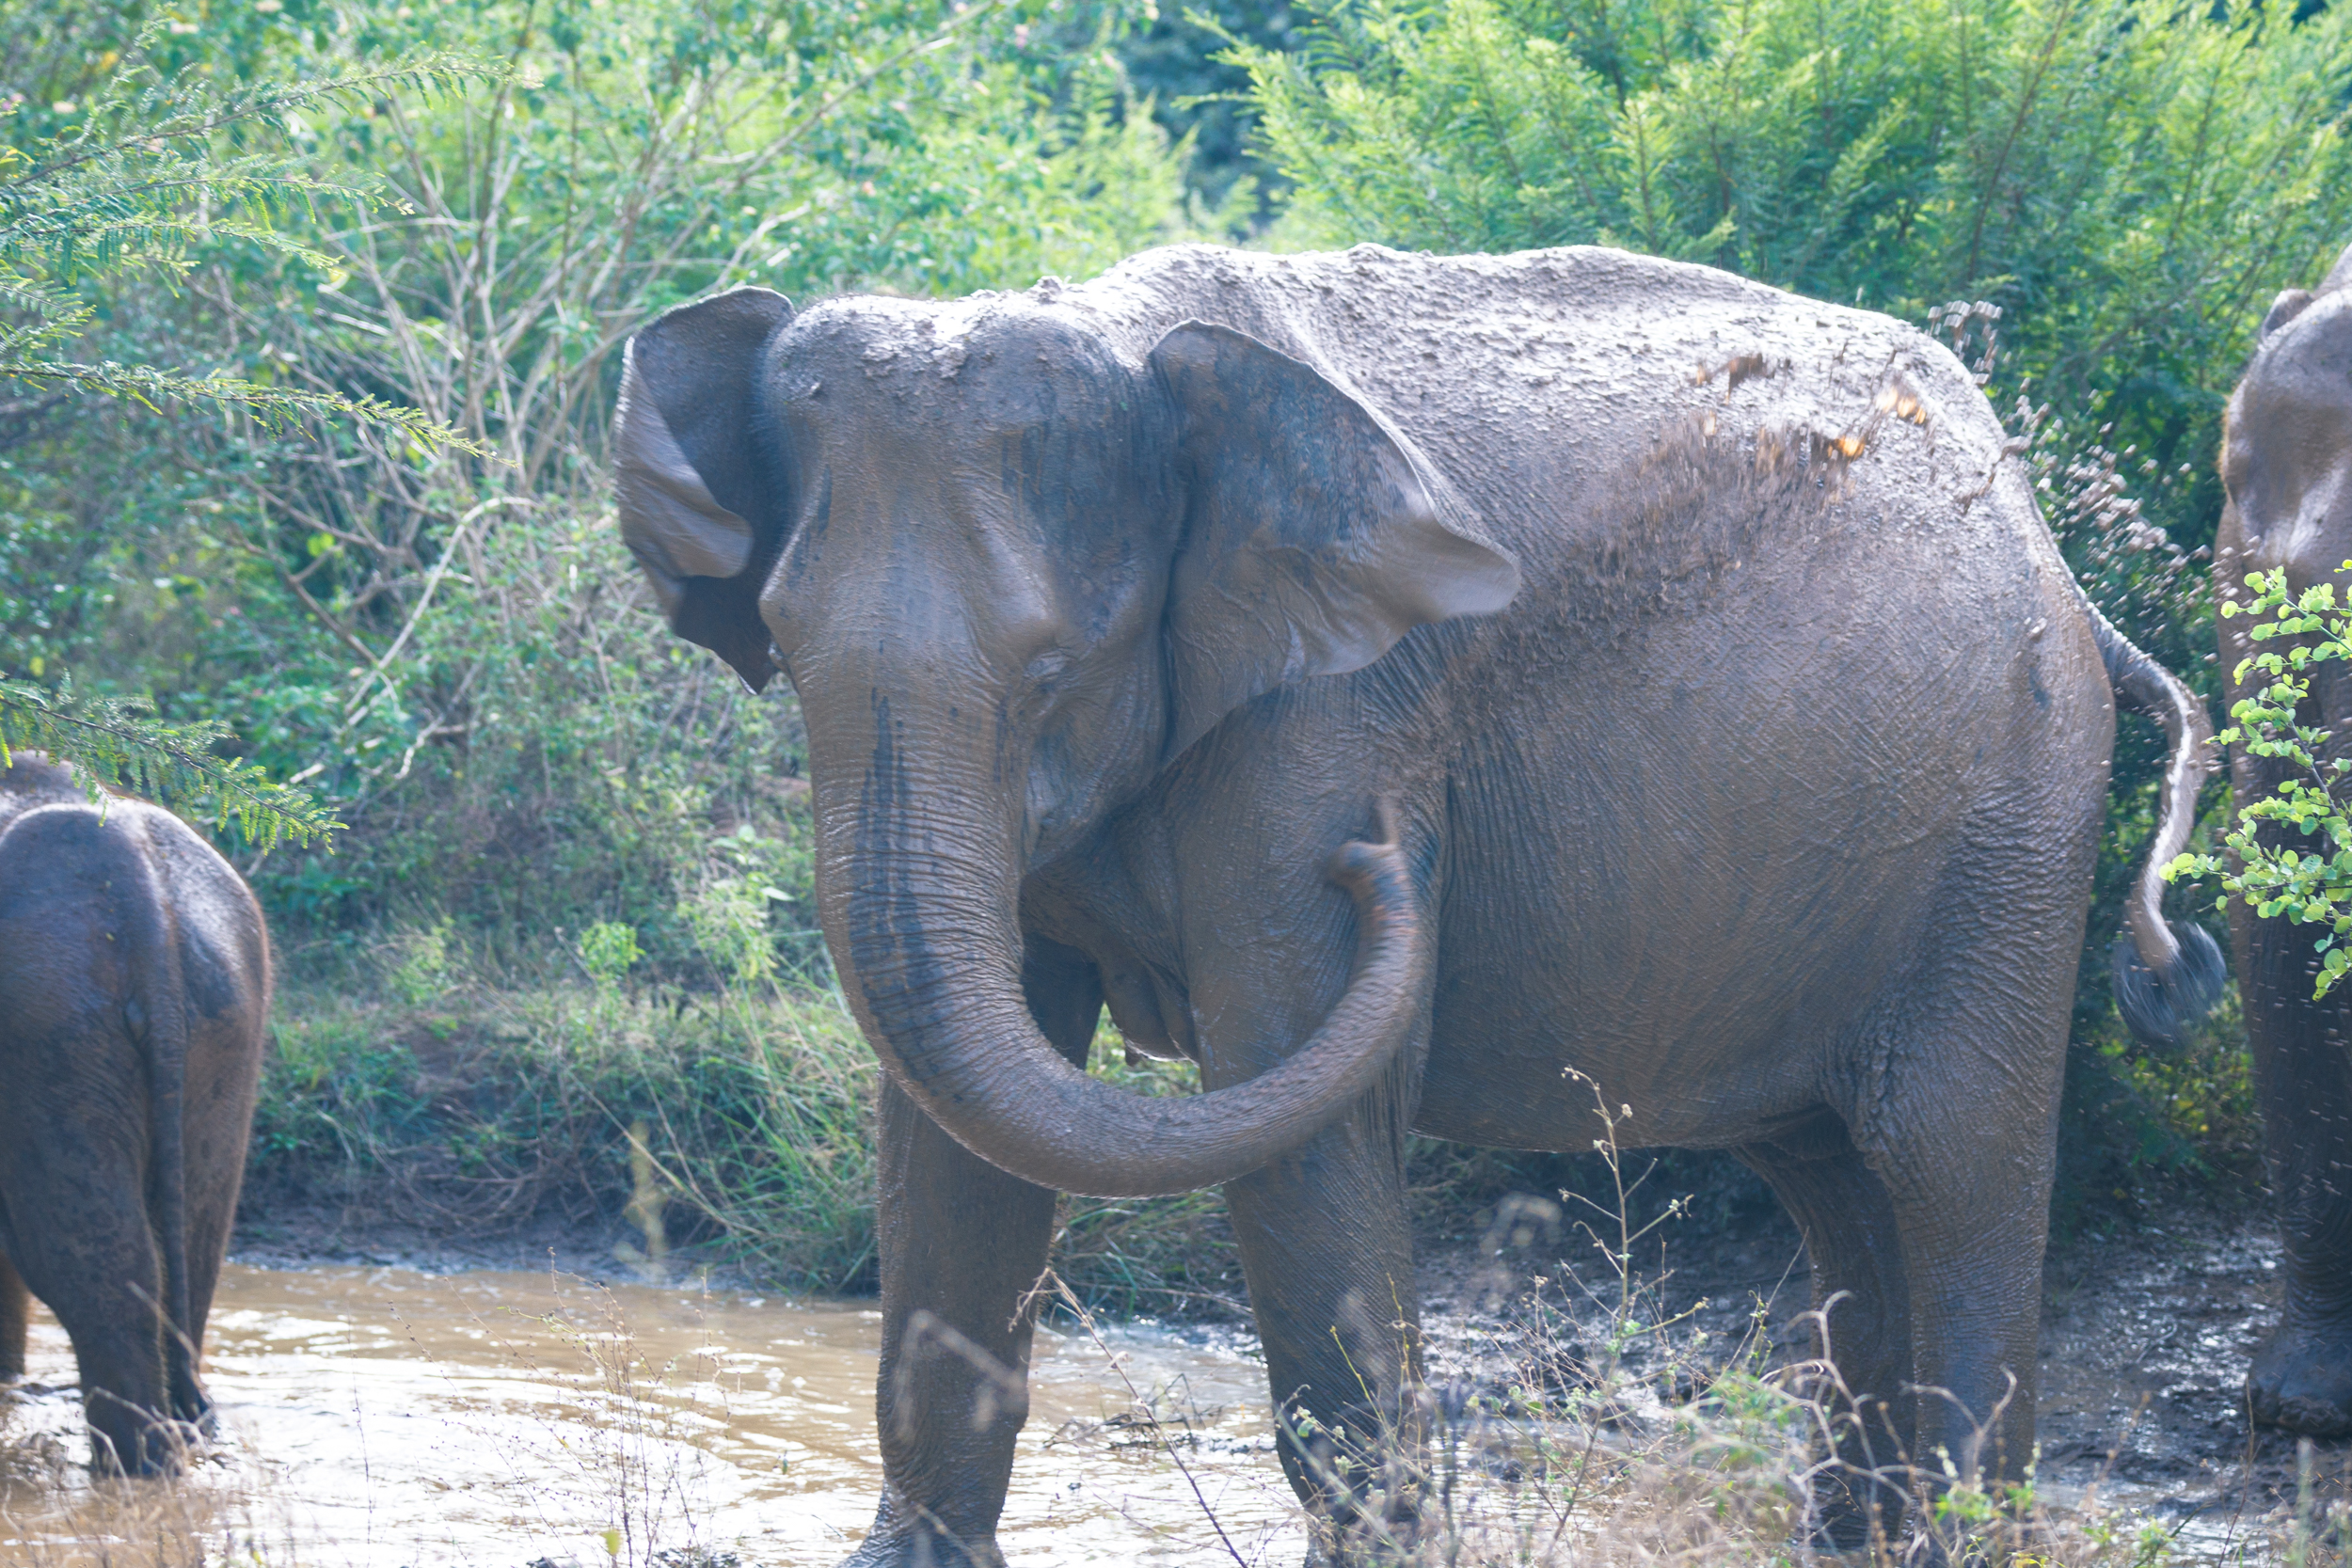 An elephant taking a mud bath at Udawalawe National Park.